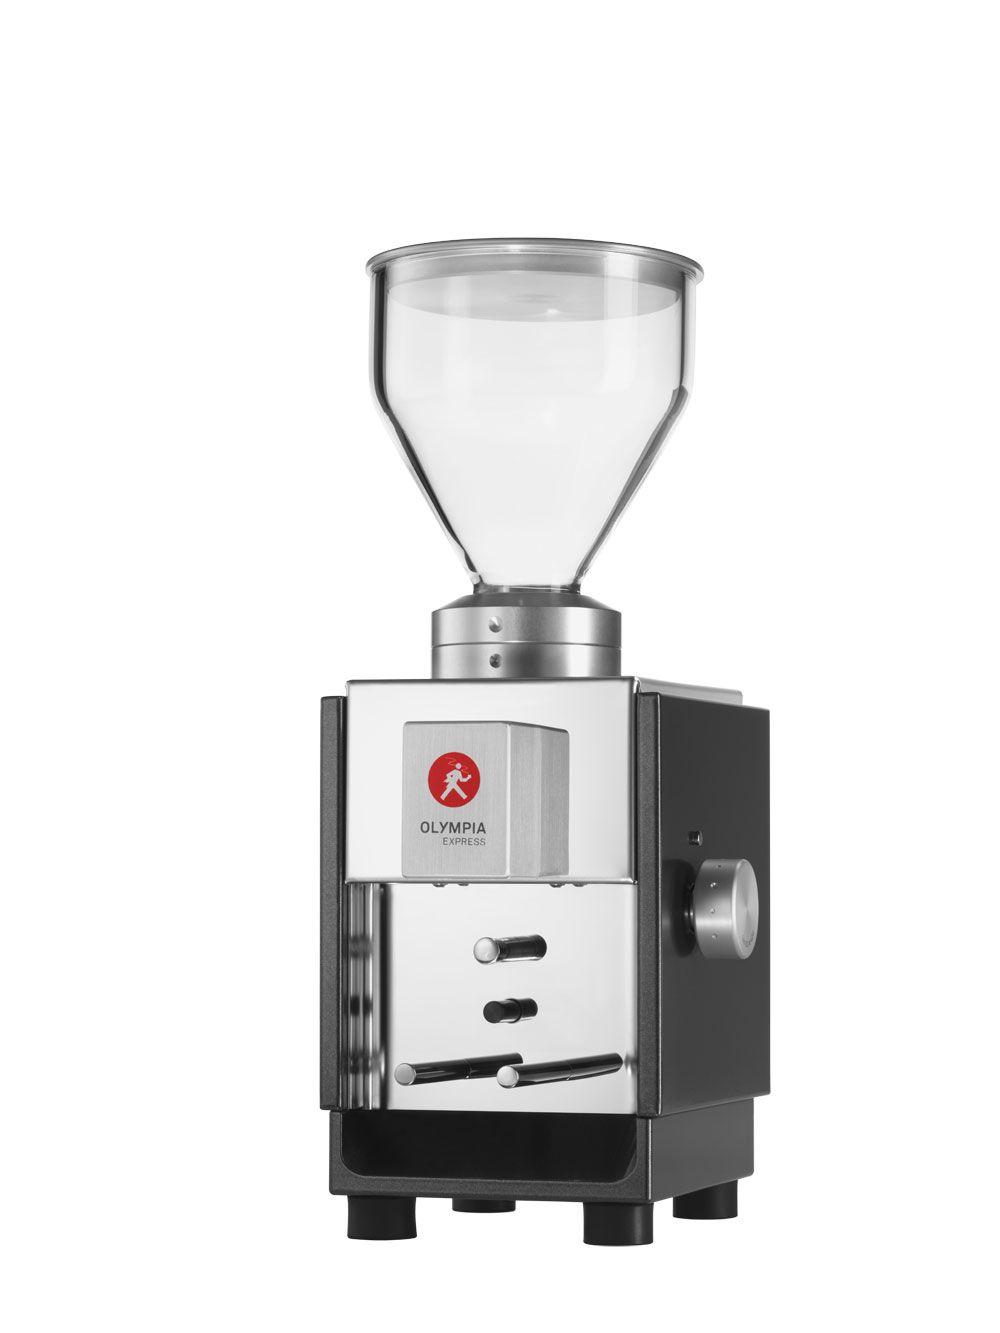 Olympia Express Moca Anthrazit Kaffeemühle